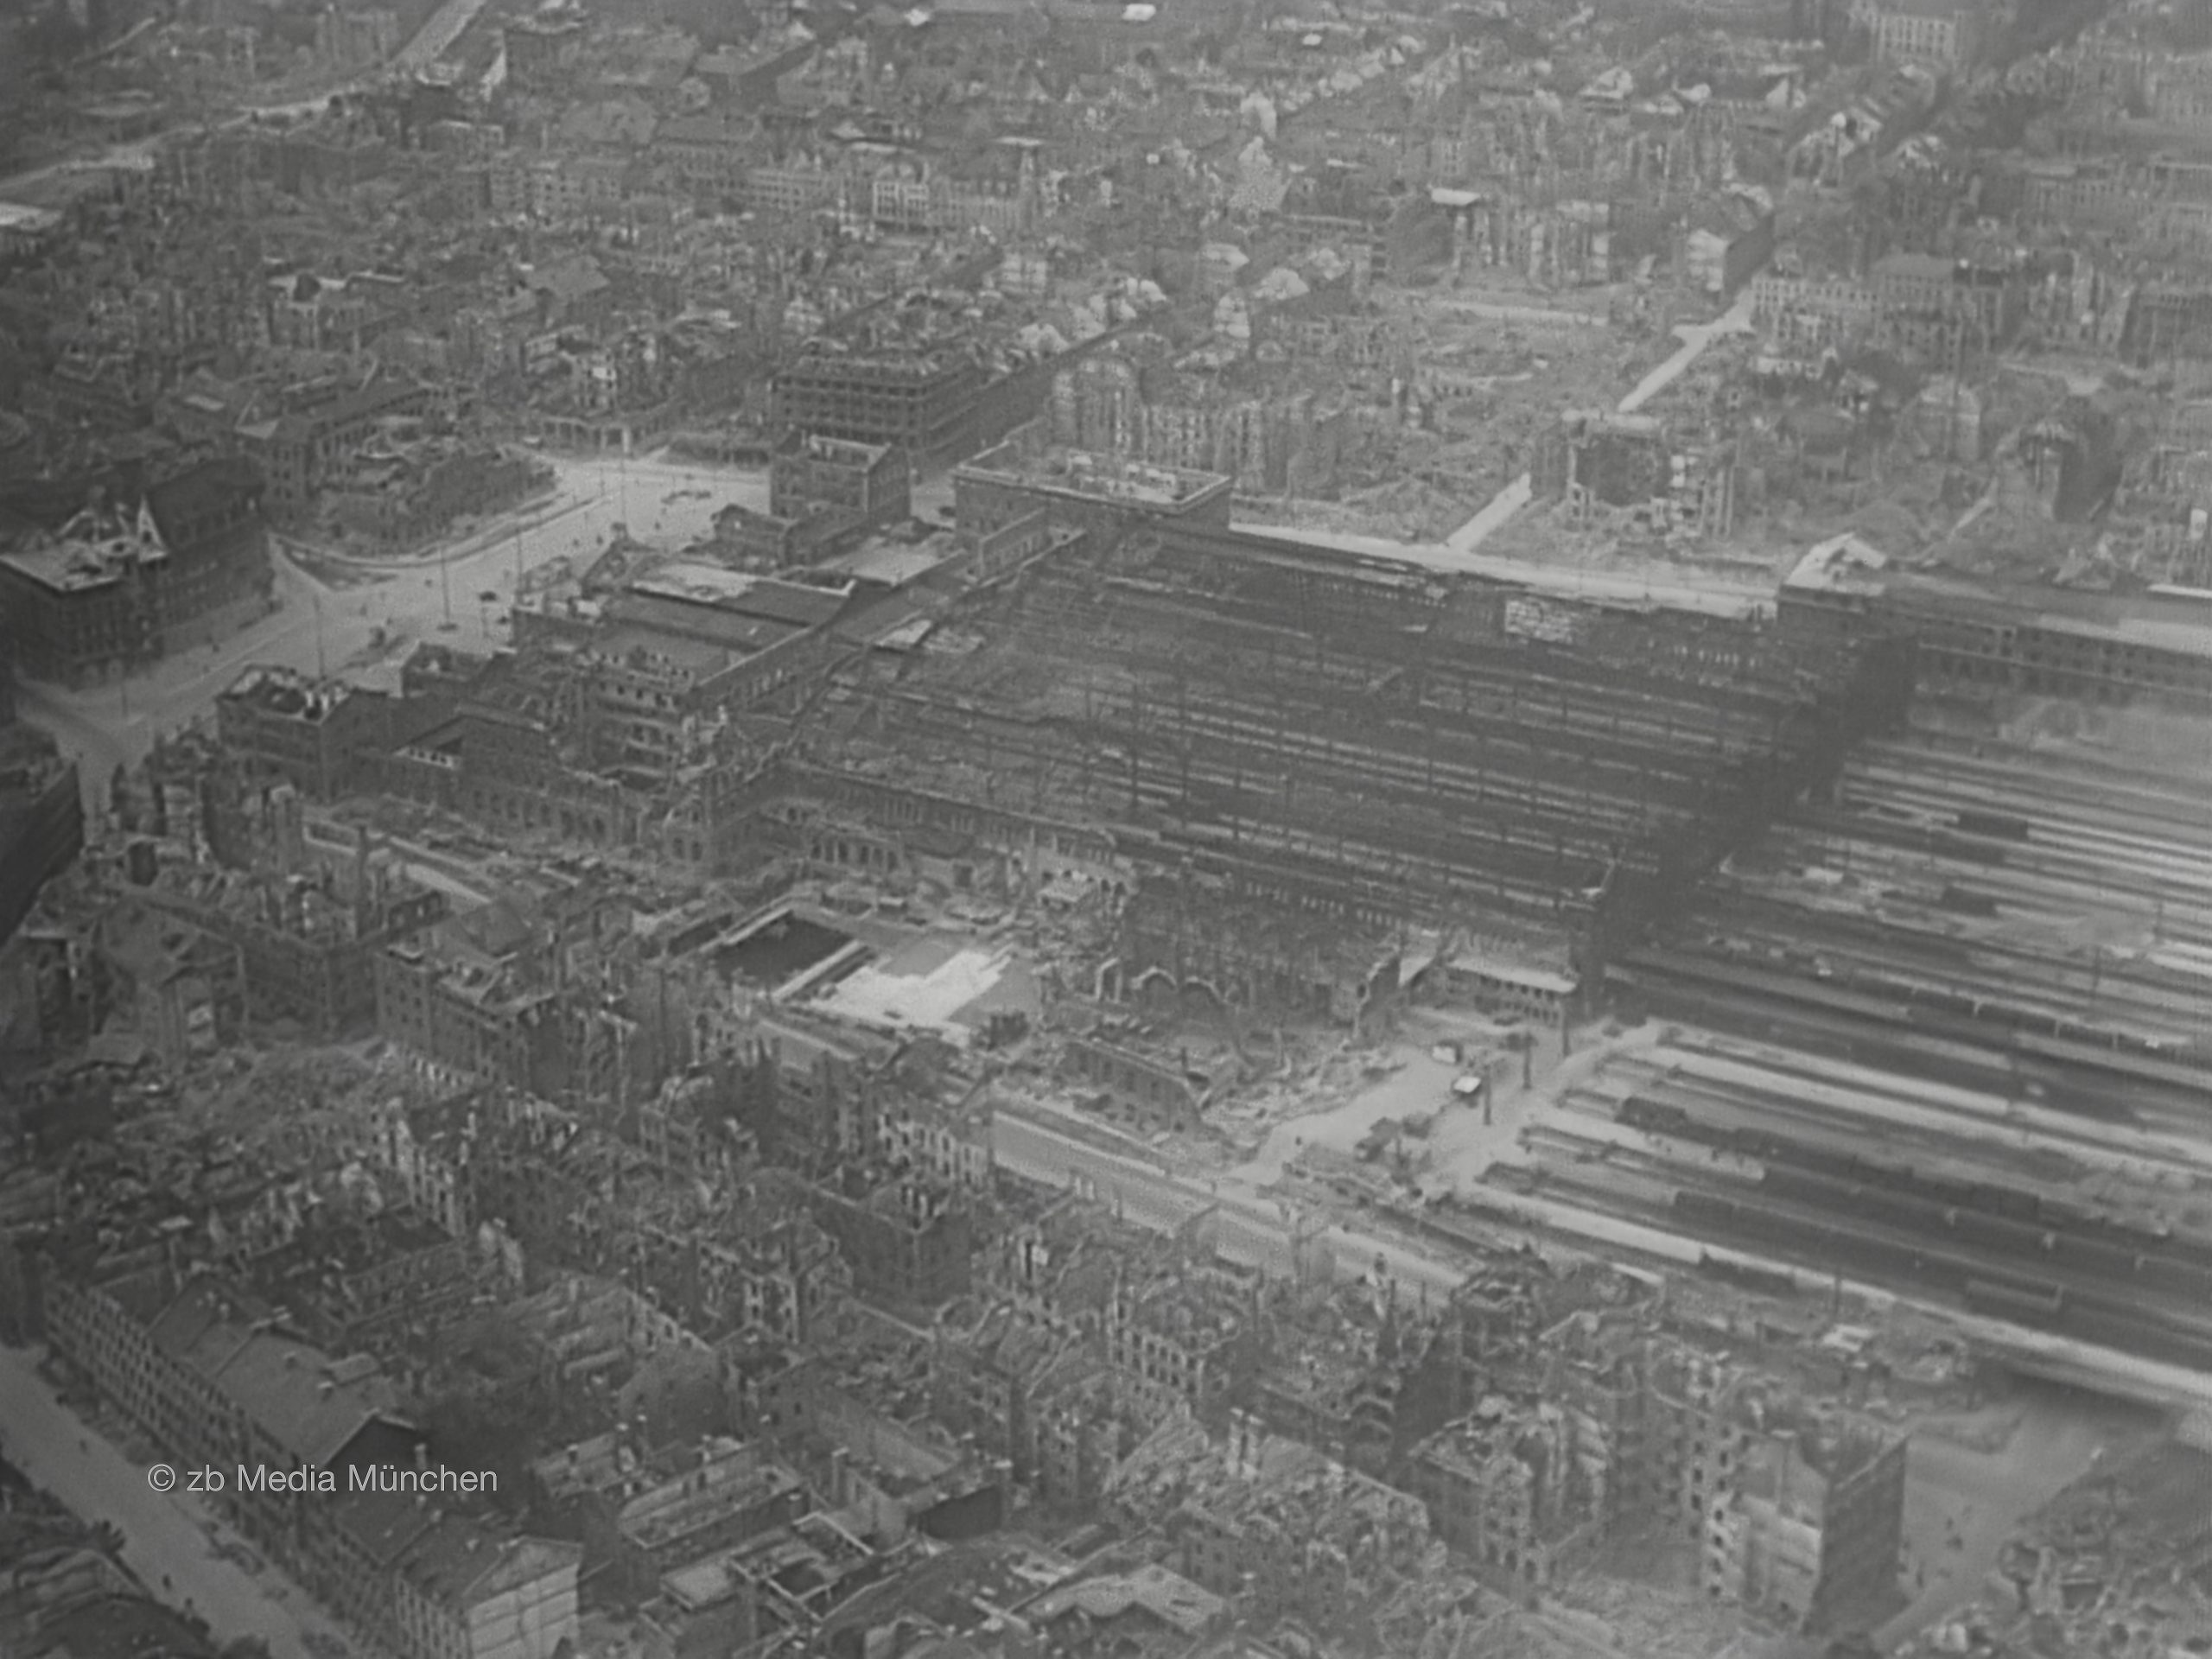 Flugaufnahme Ruinen Hauptbahnhof München